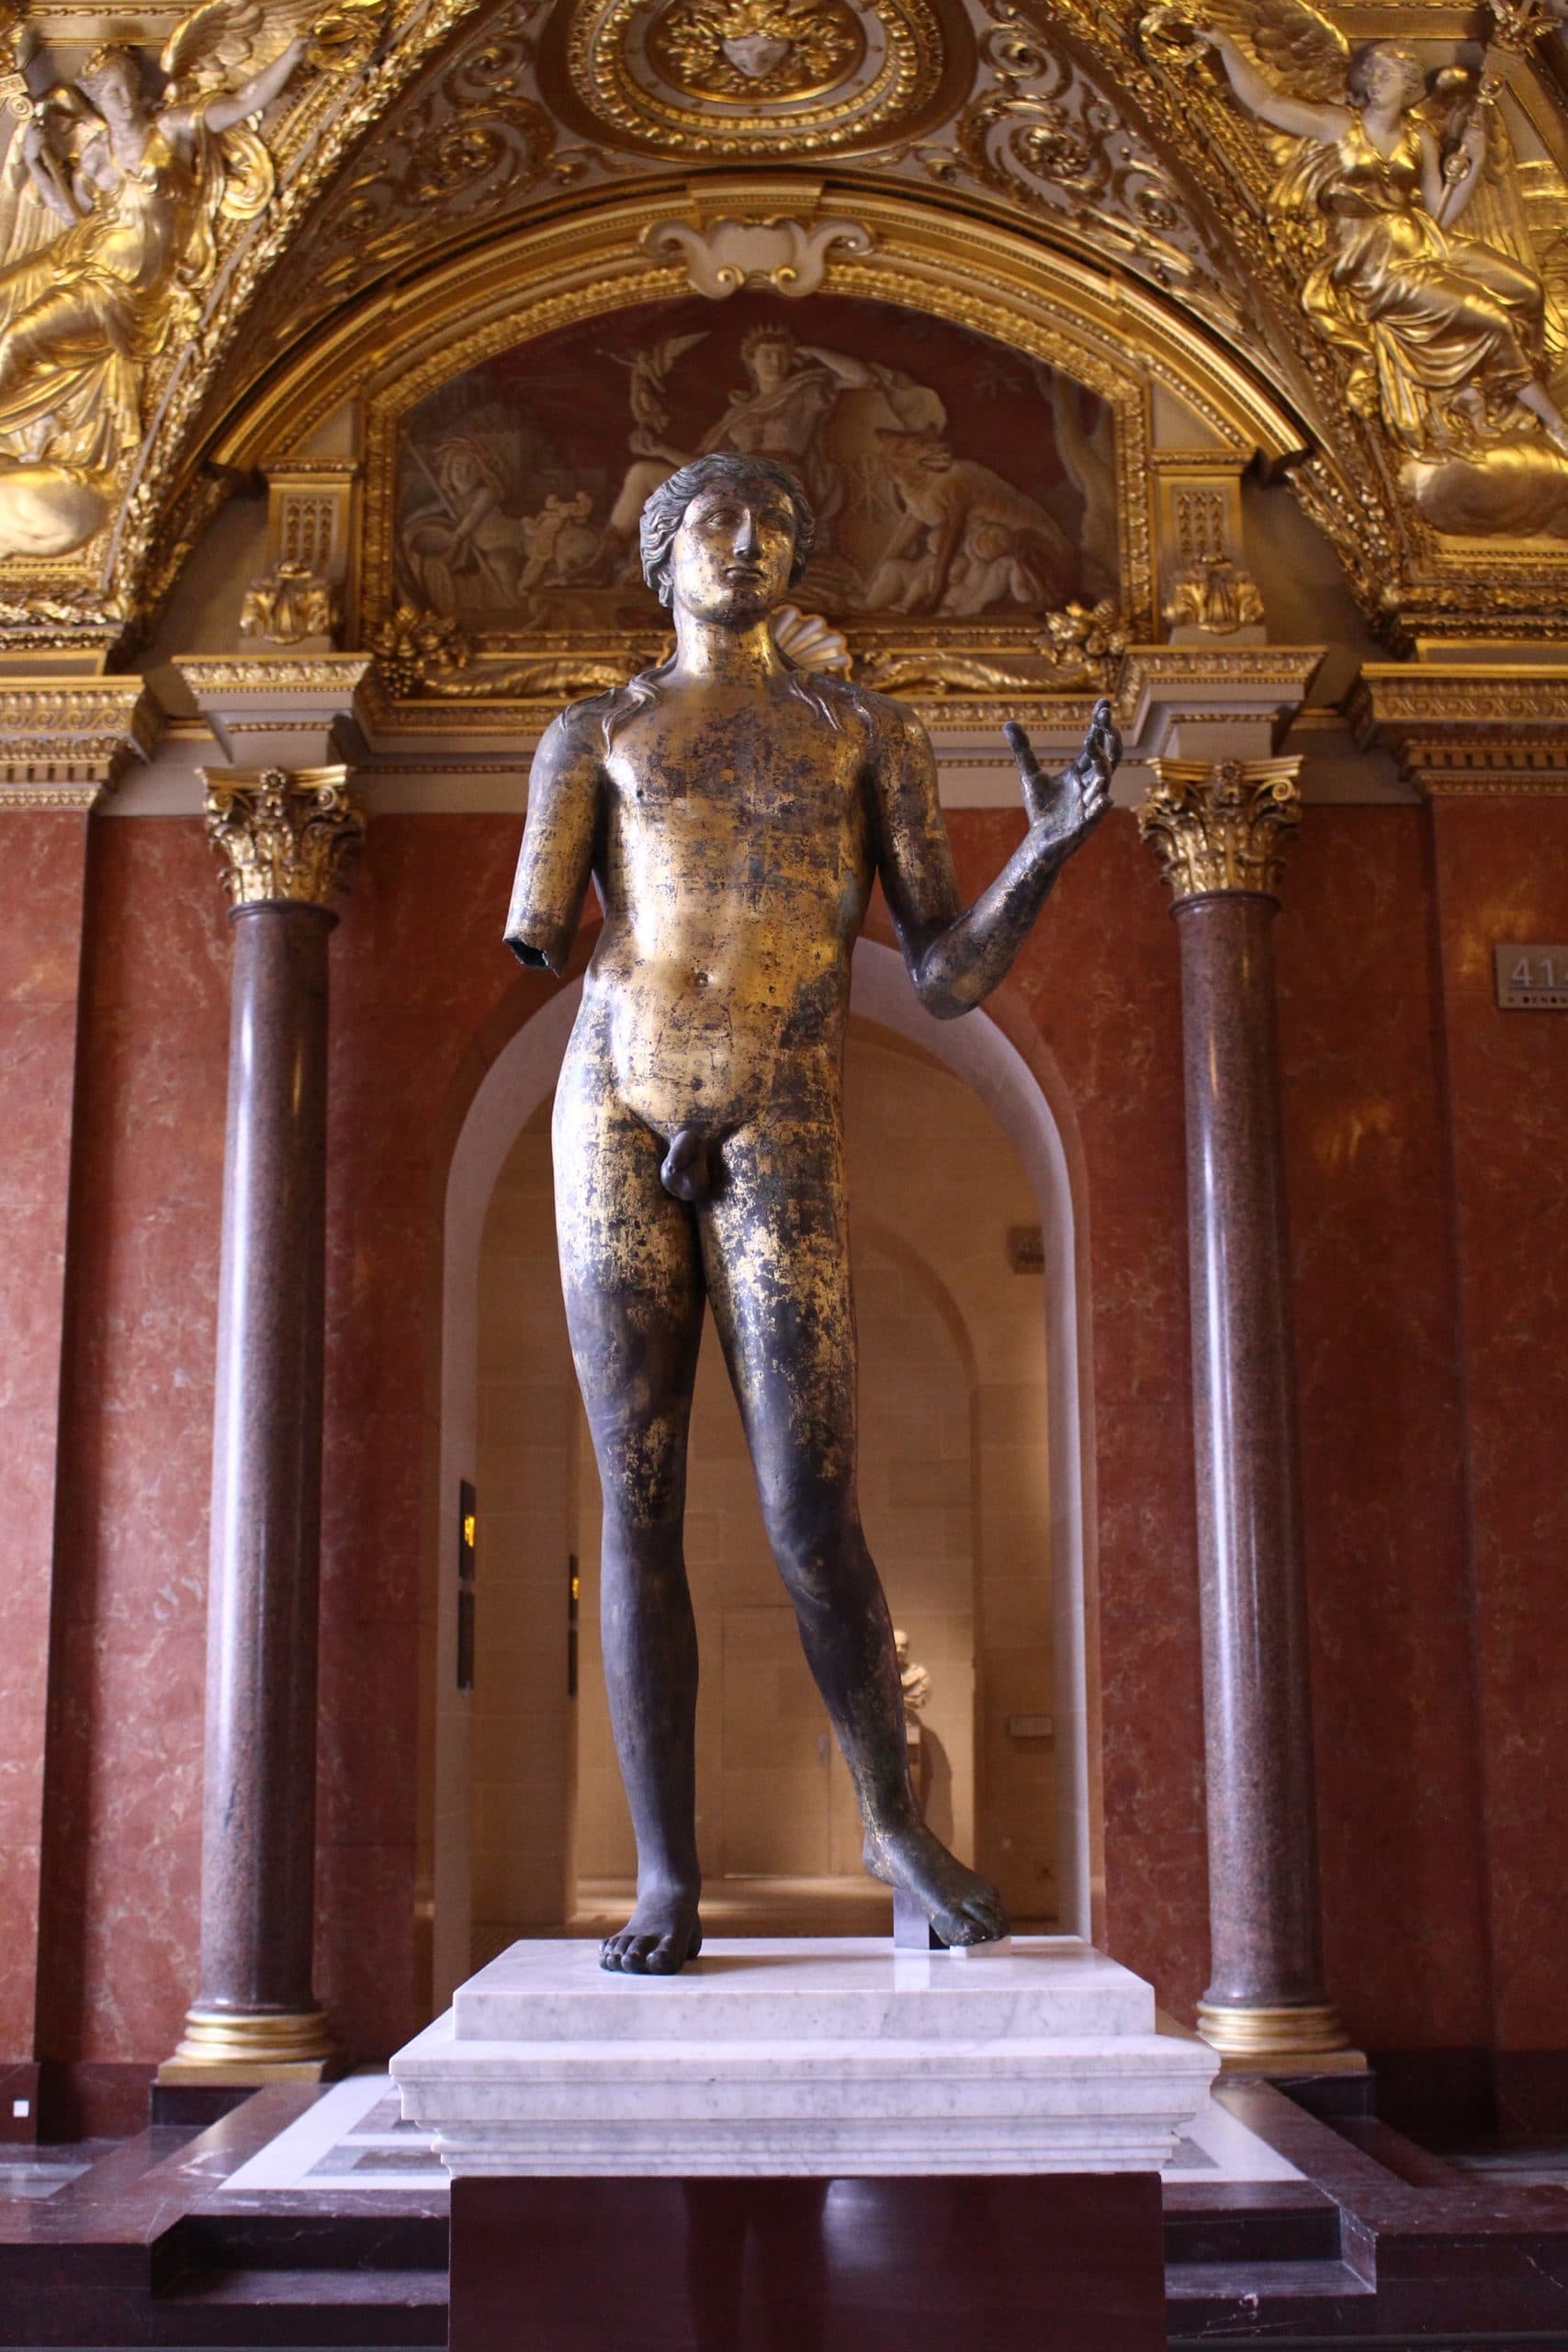 Sculpture 8 - Louvre